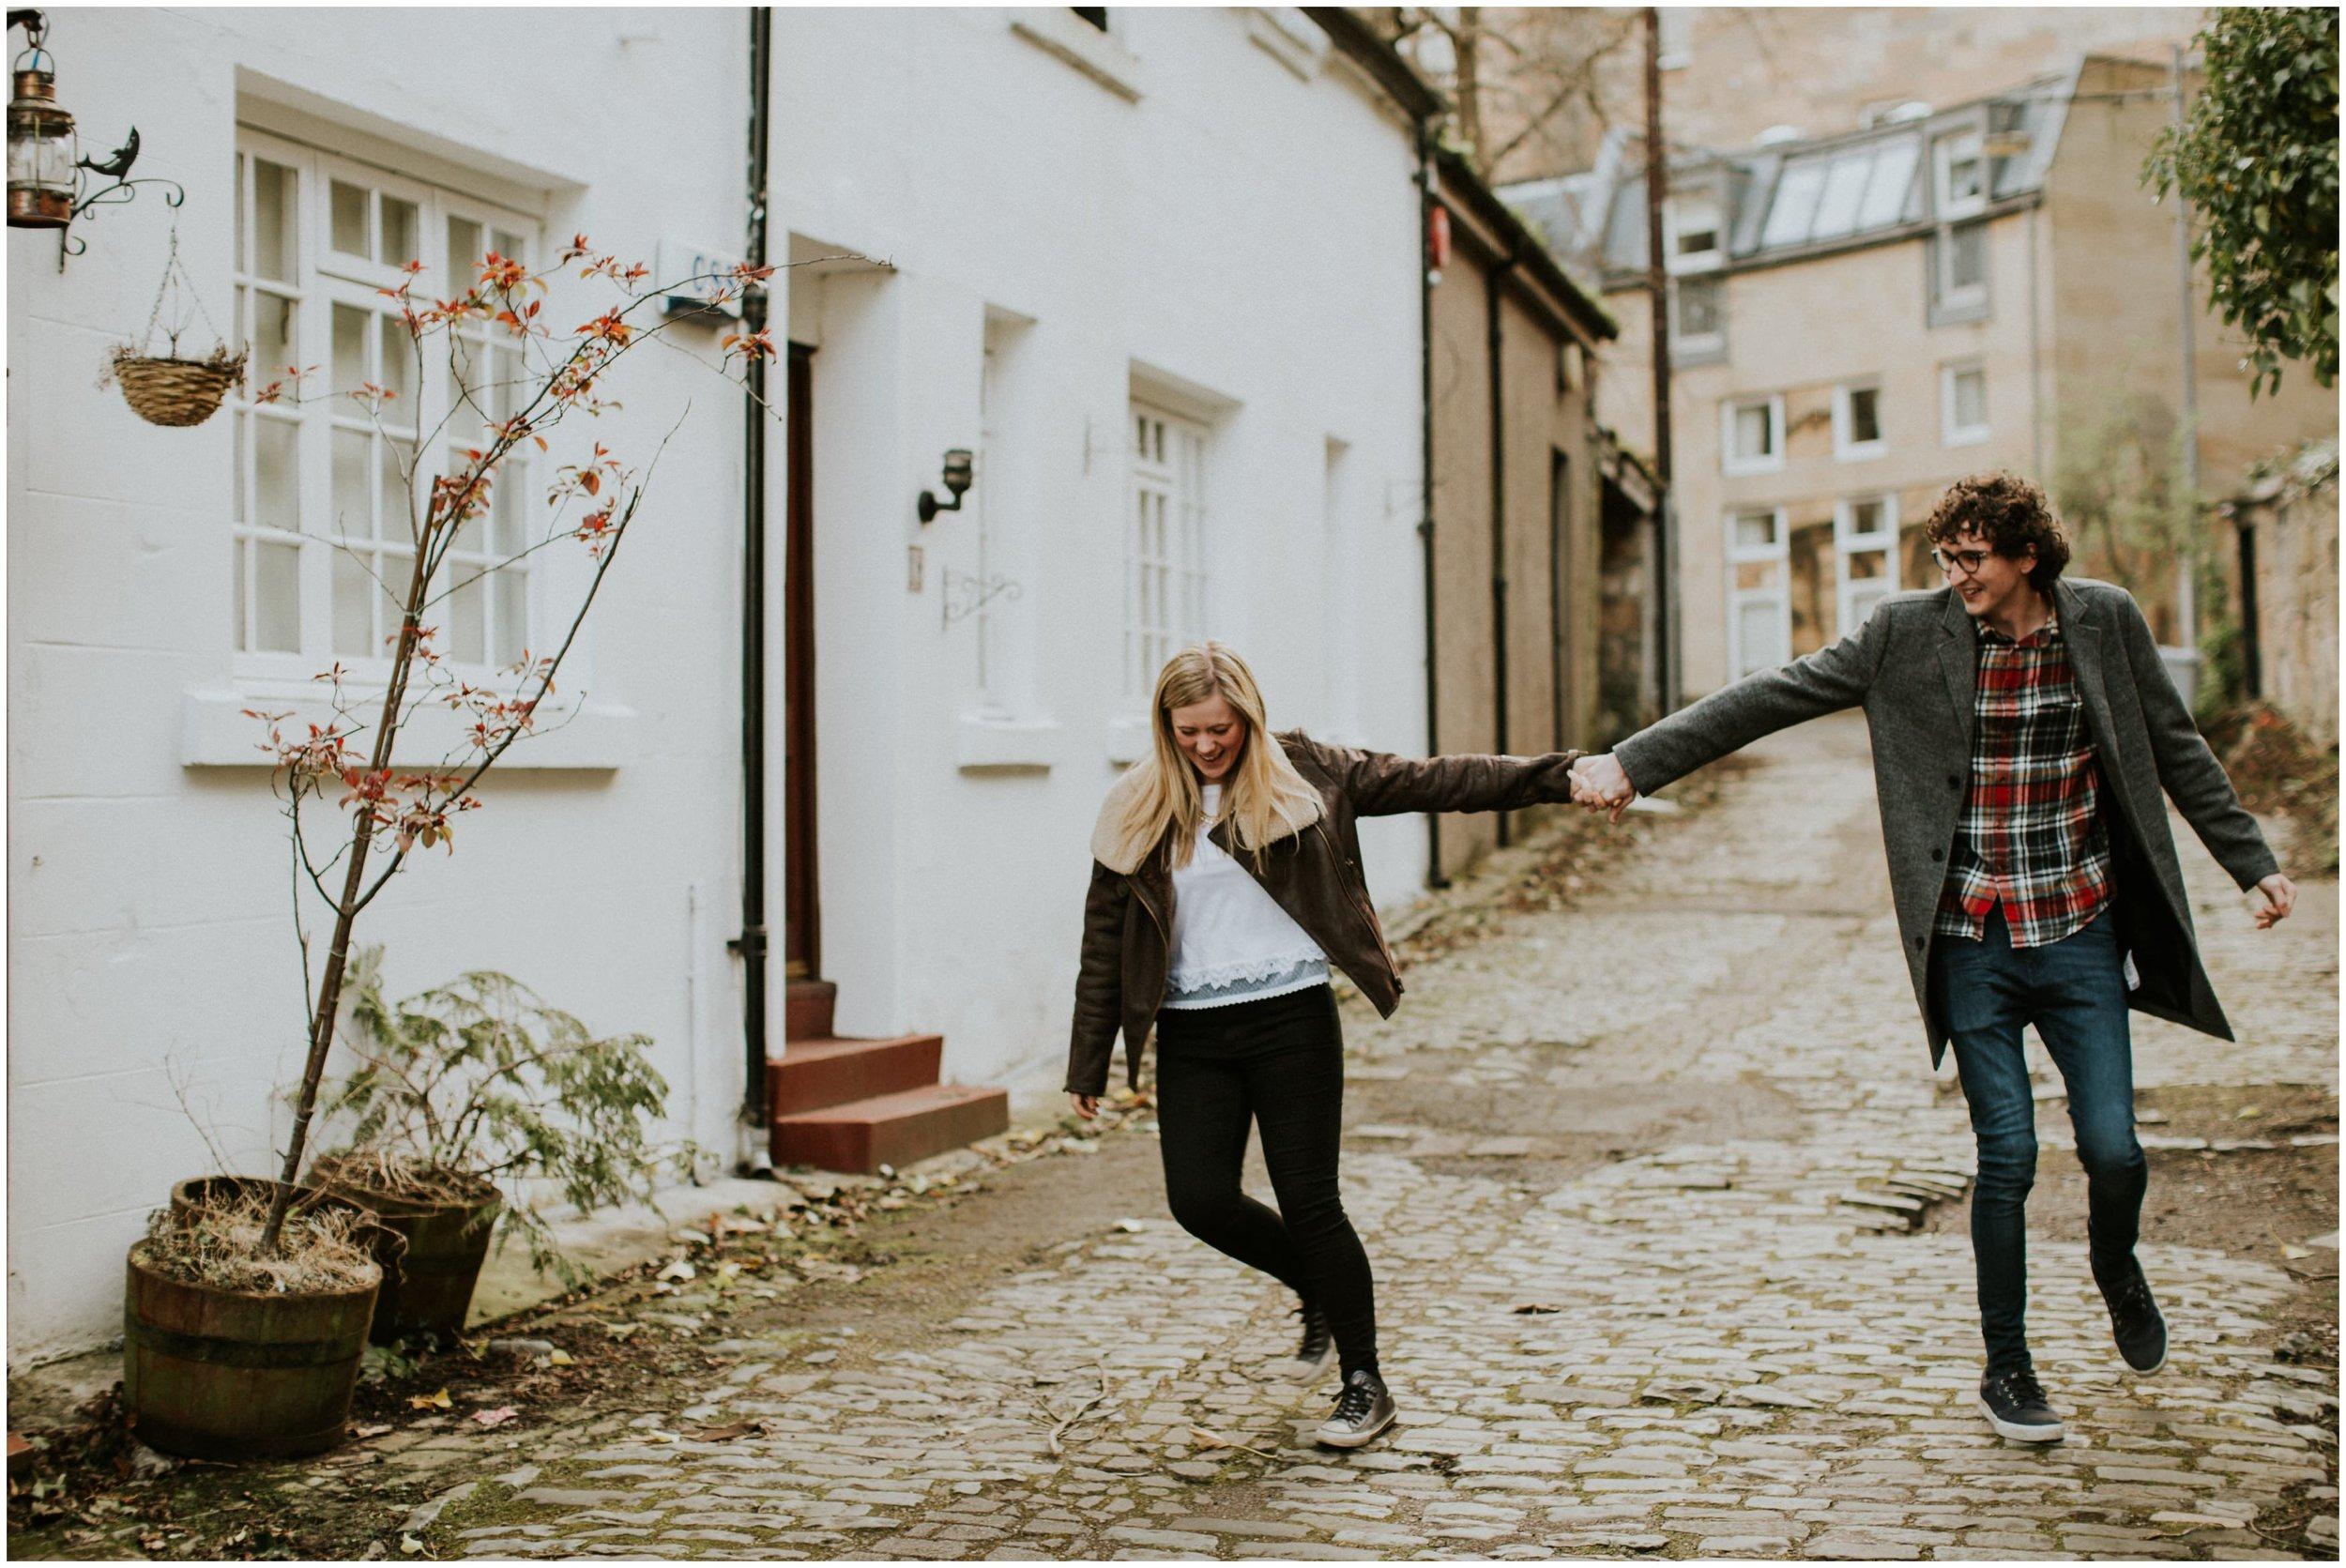 Photography 78 - Glasgow Wedding Photographer - April & Fraser - Park Circus Engagement_0001.jpg